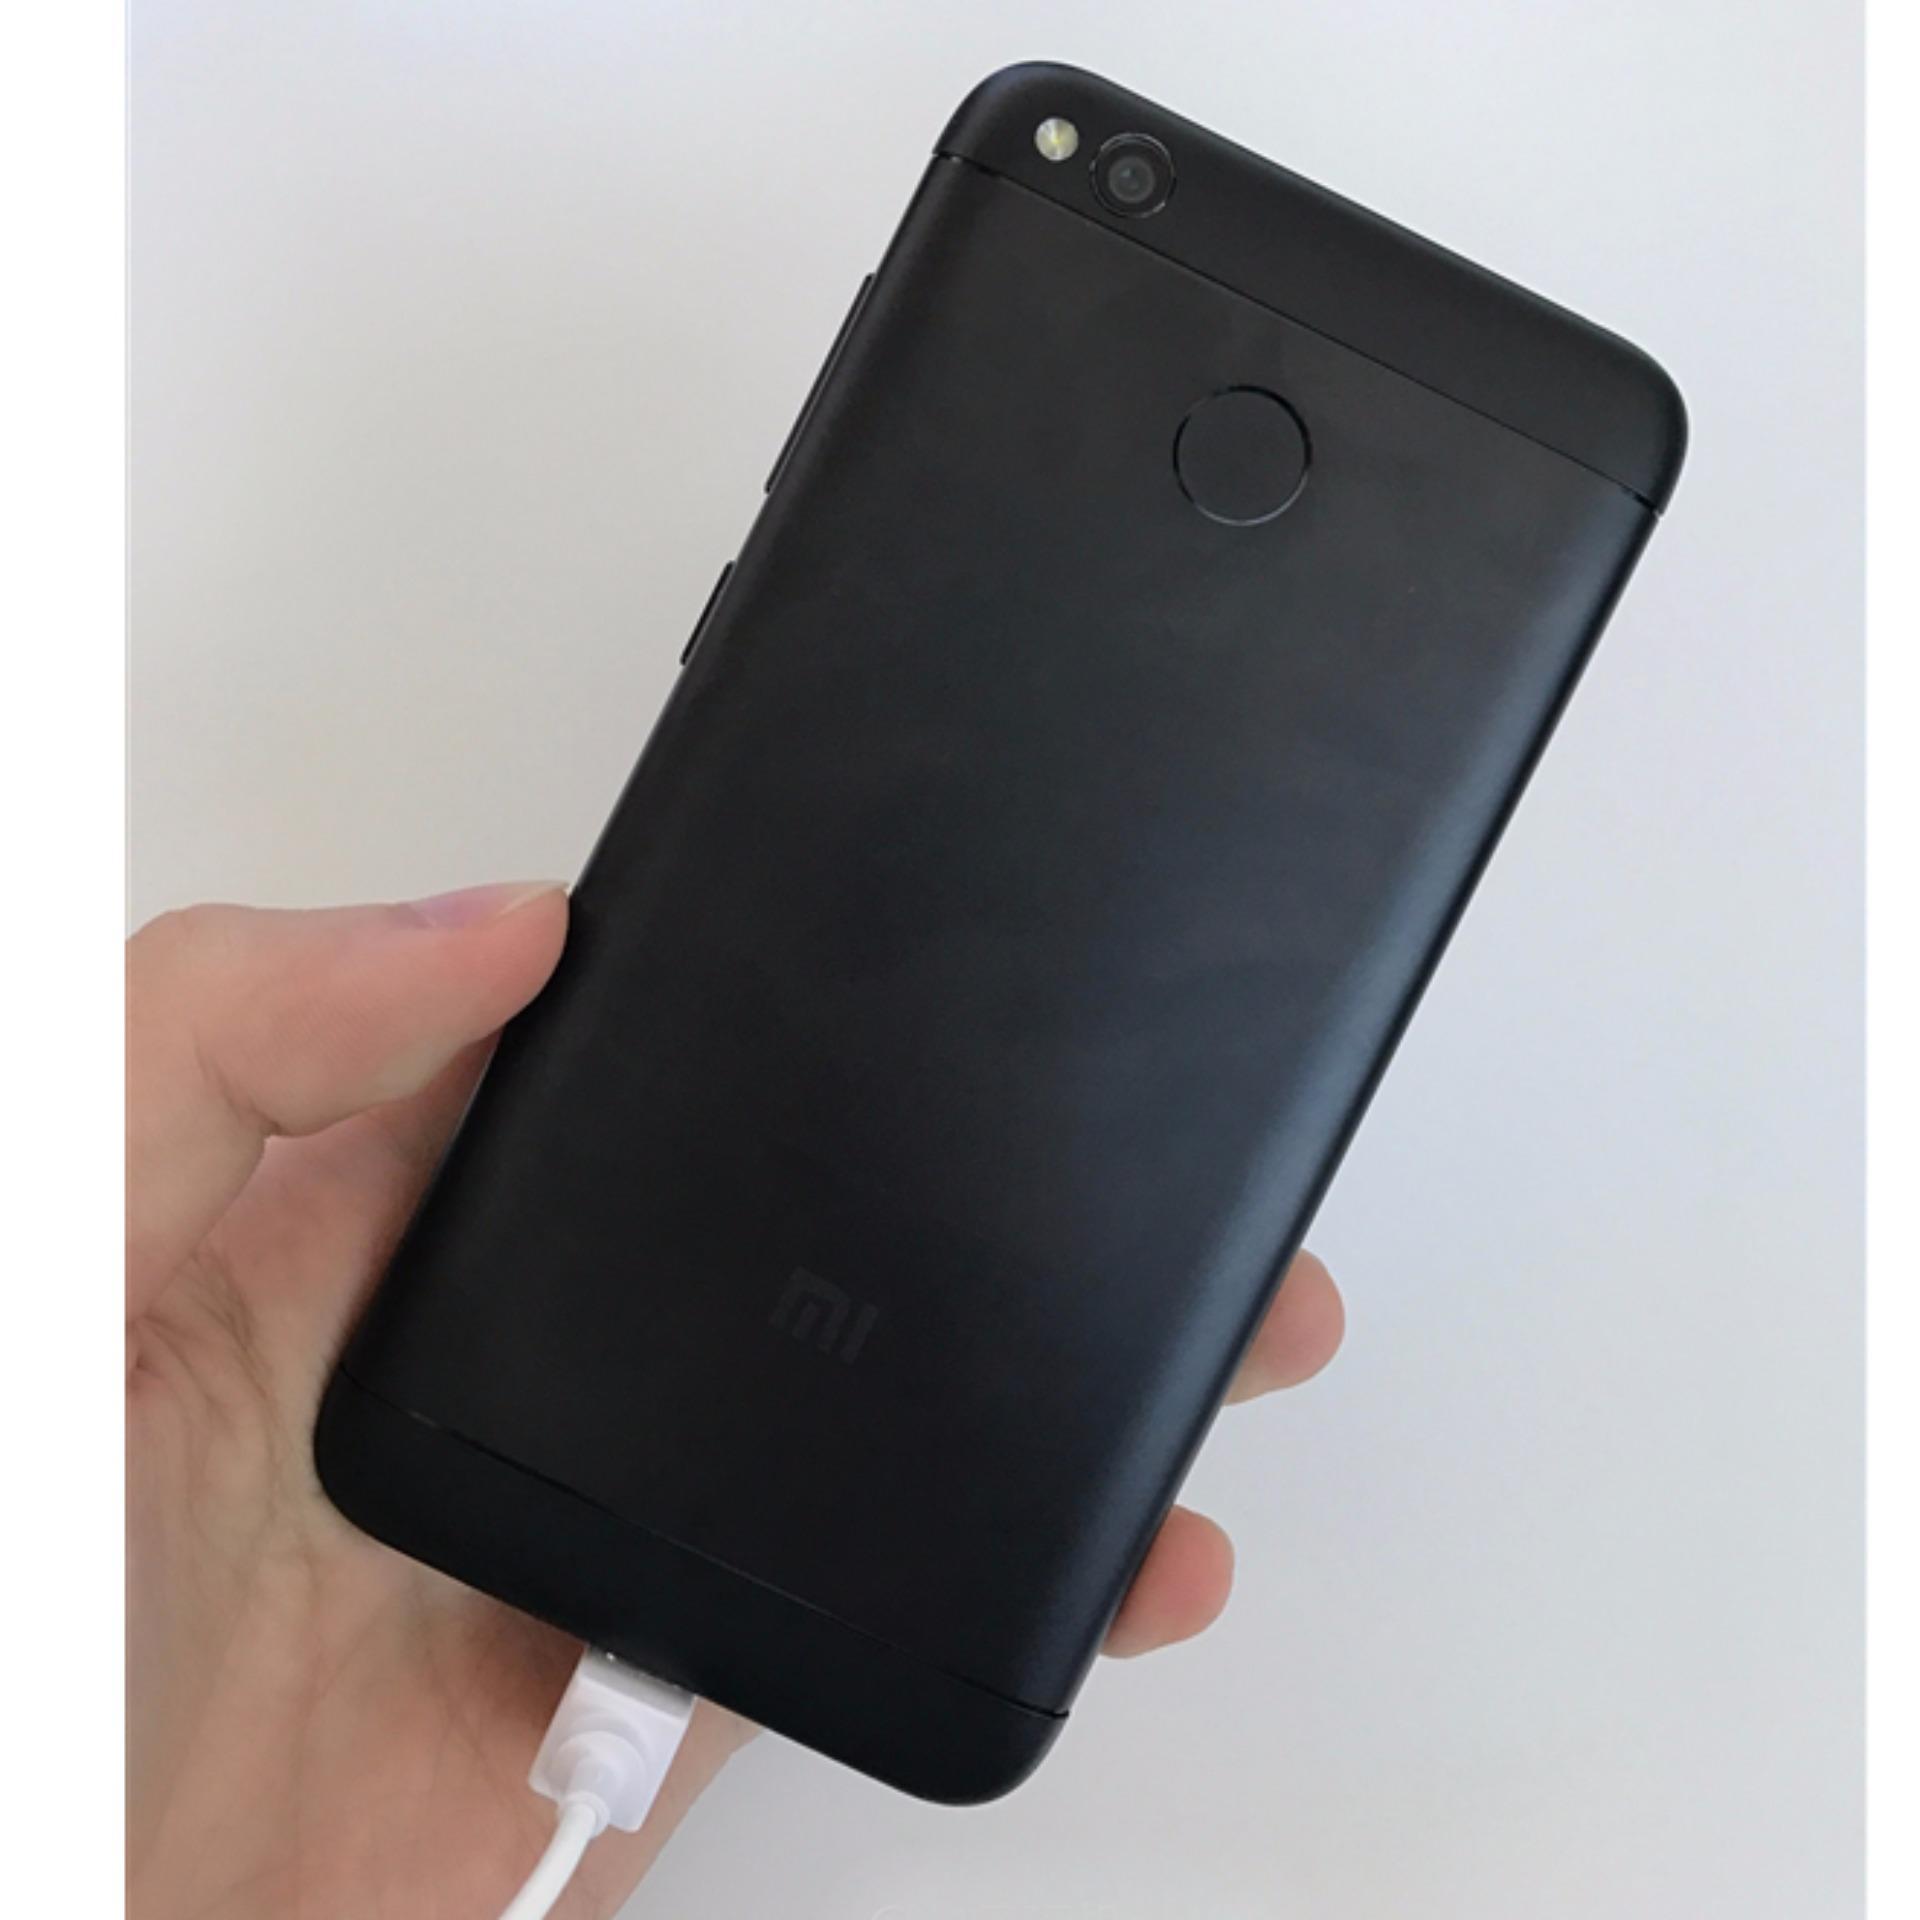 Harga Penawaran Xiaomi Redmi 4x Garansi Resmi Distributor 1 Tahun Prime 32gb Tam